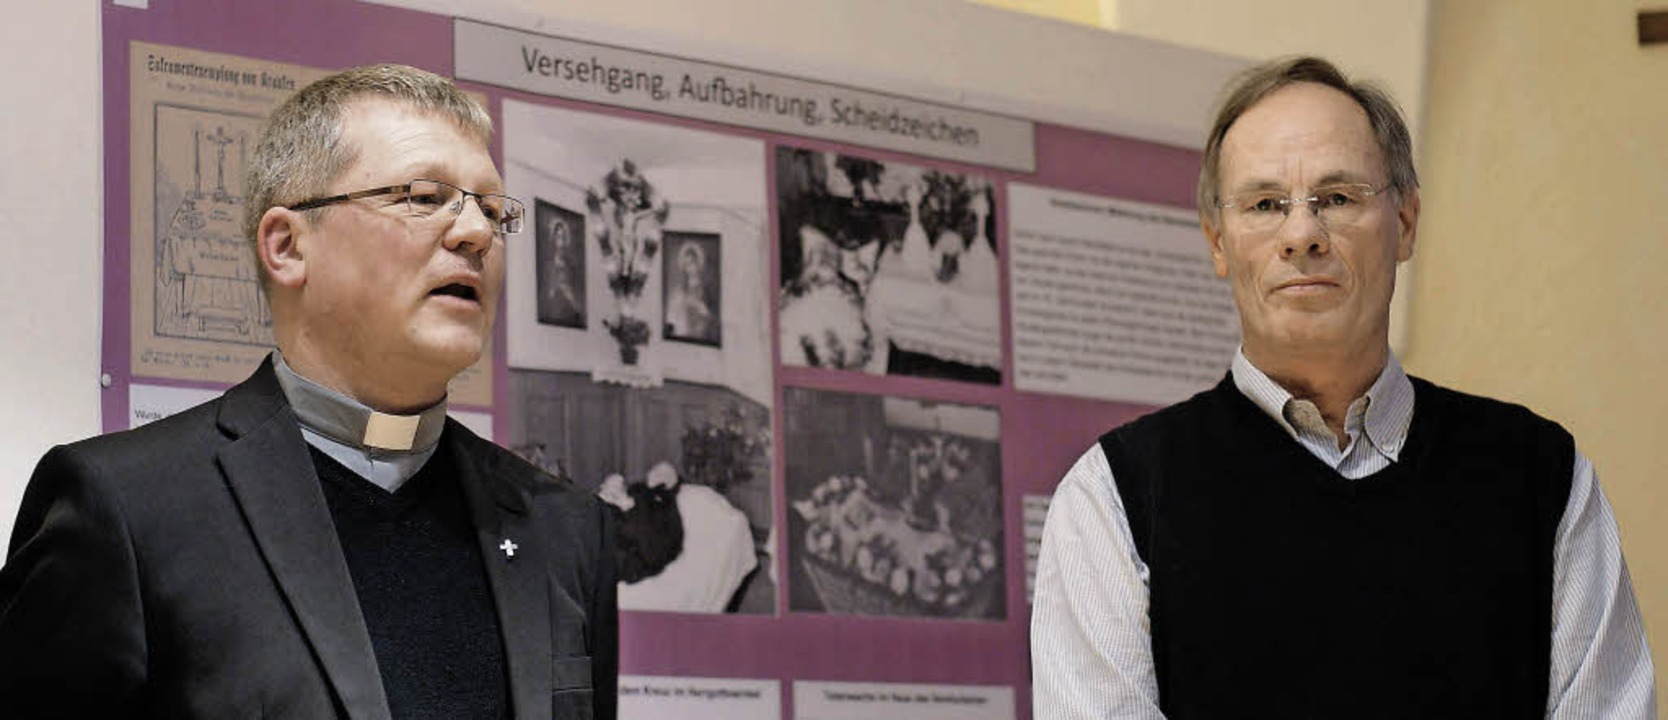 Pfarrer Stefan Meisert (links) und Tho...farrgang der Klosterkirche St. Peter.     Foto: Christian John